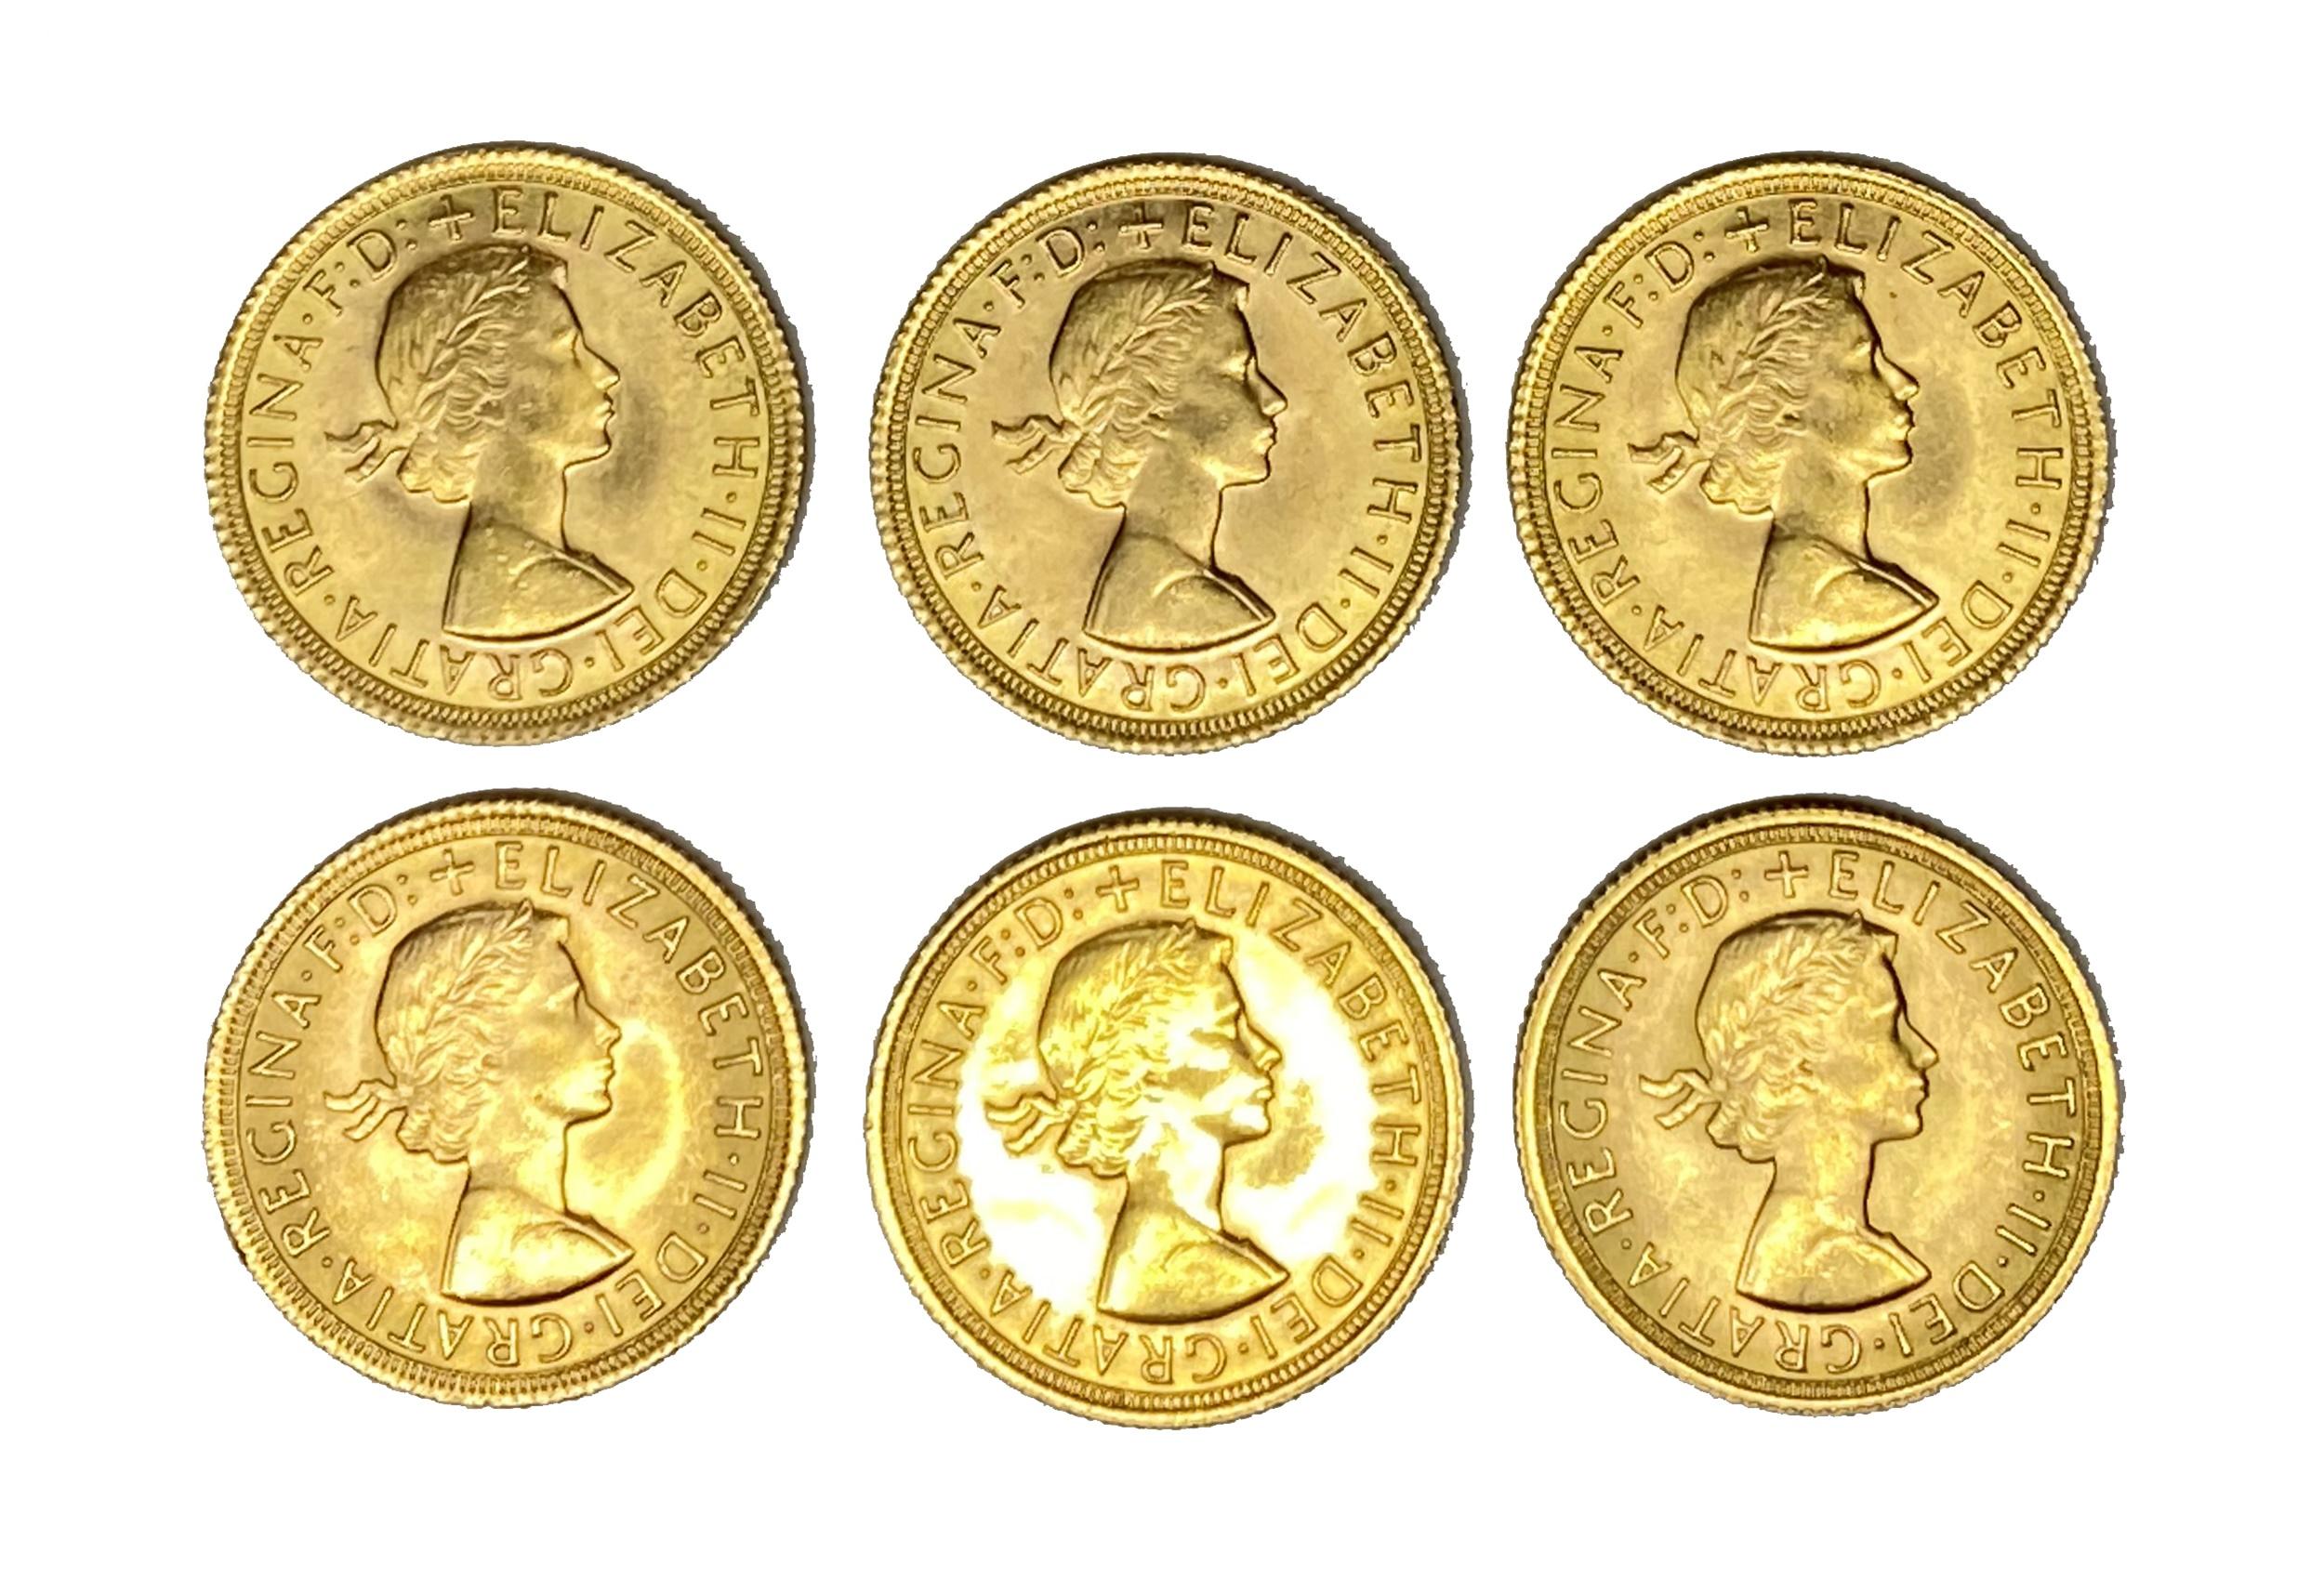 Elizabeth II six gold Sovereign coins, 1968